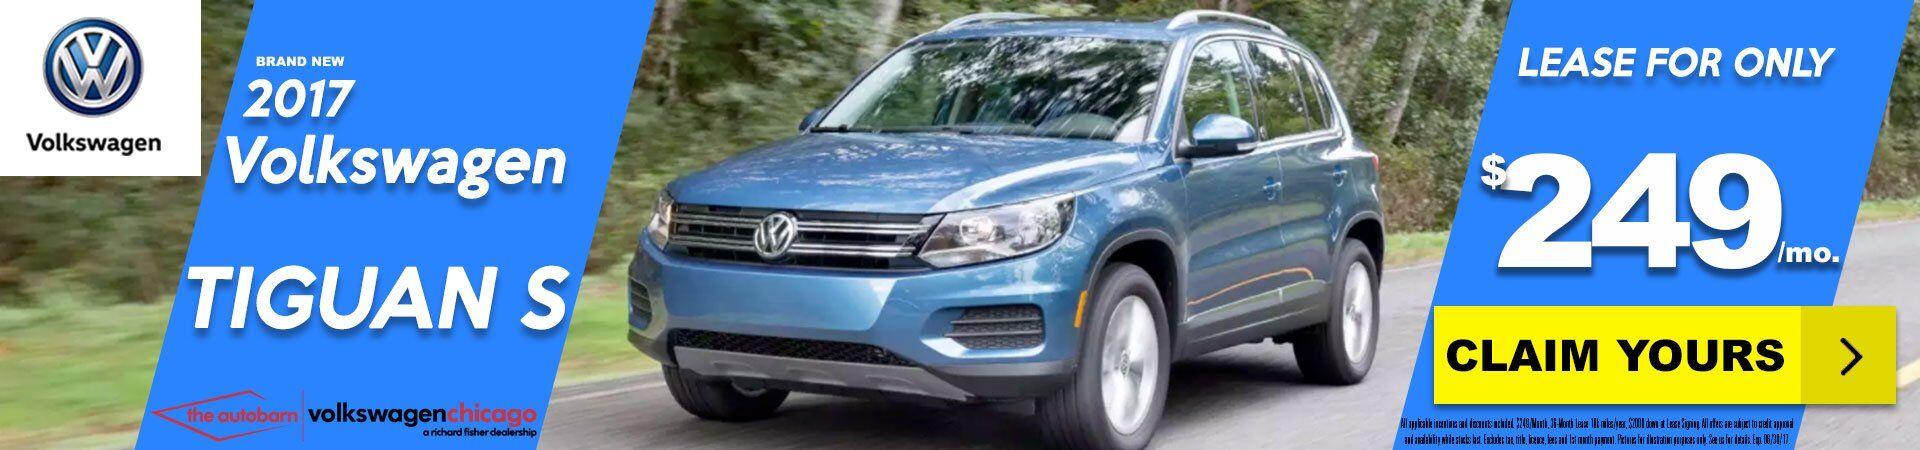 New & Used Volkswagen Vehicles | Chicago, IL Volkswagen Dealership